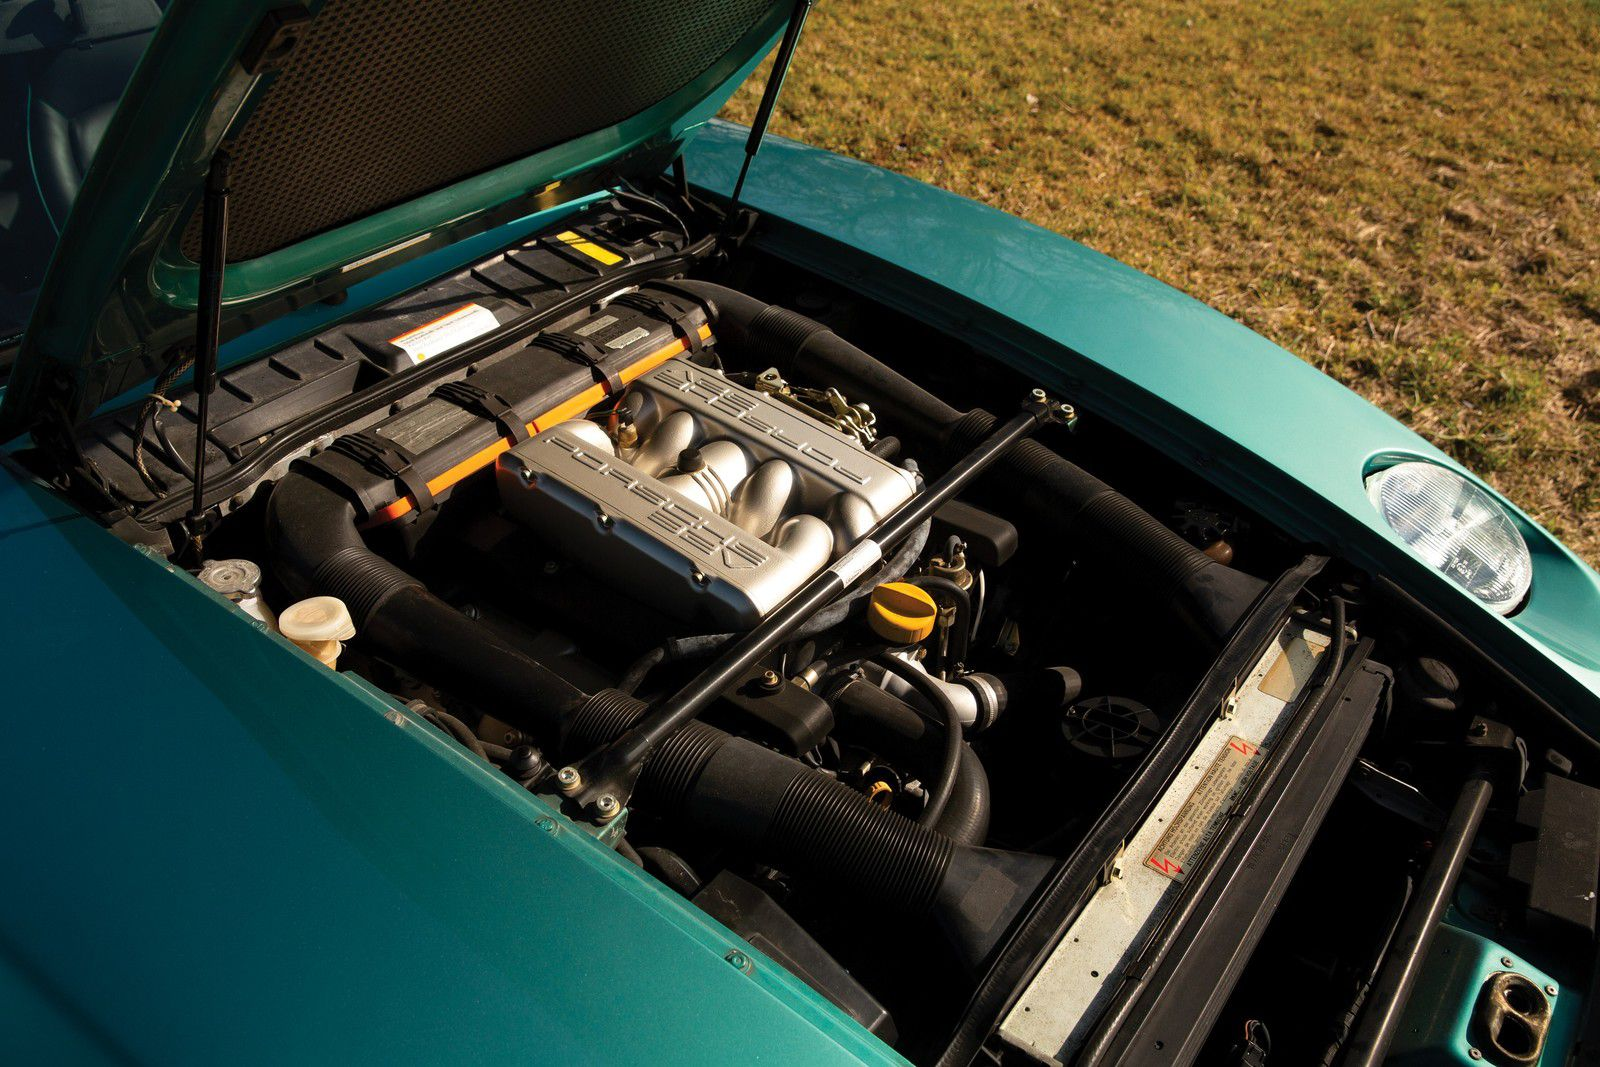 VOITURES DE LEGENDE (1234) : PORSCHE  928 GTS  5.4 V8 - 1992